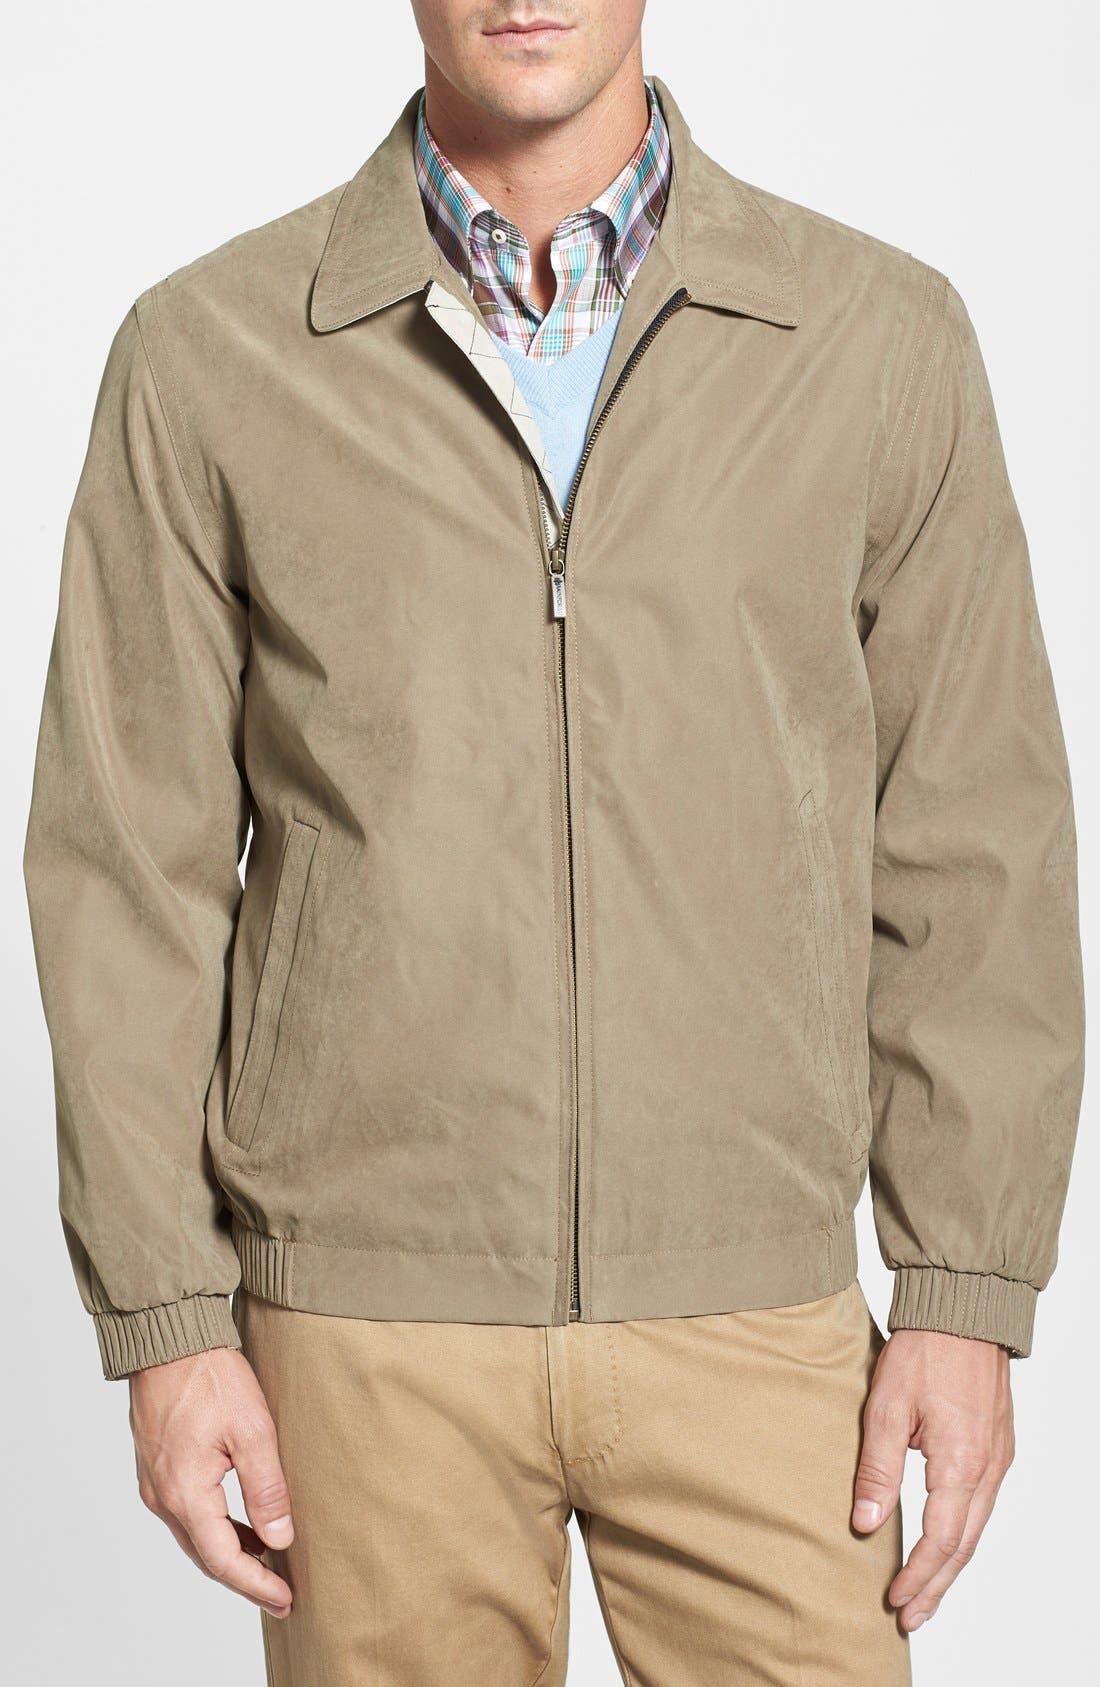 Alternate Image 1 Selected - RAINFOREST 'Microseta' Lightweight Golf Jacket